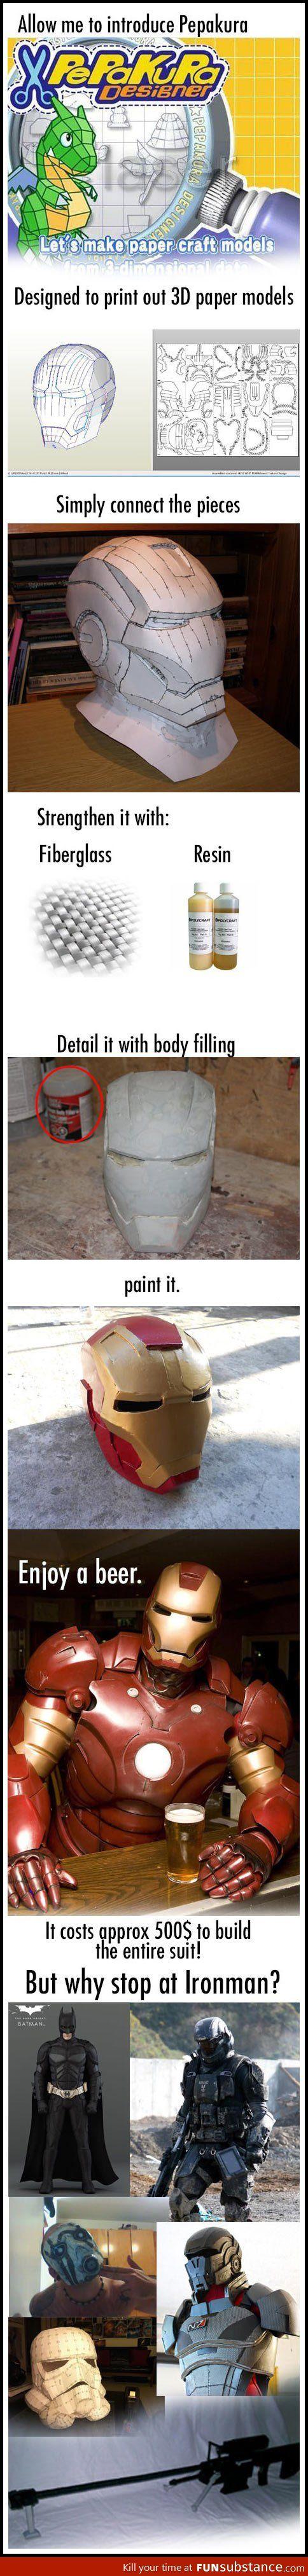 Make your own Iron Man suit @Virginia Kraljevic Allred